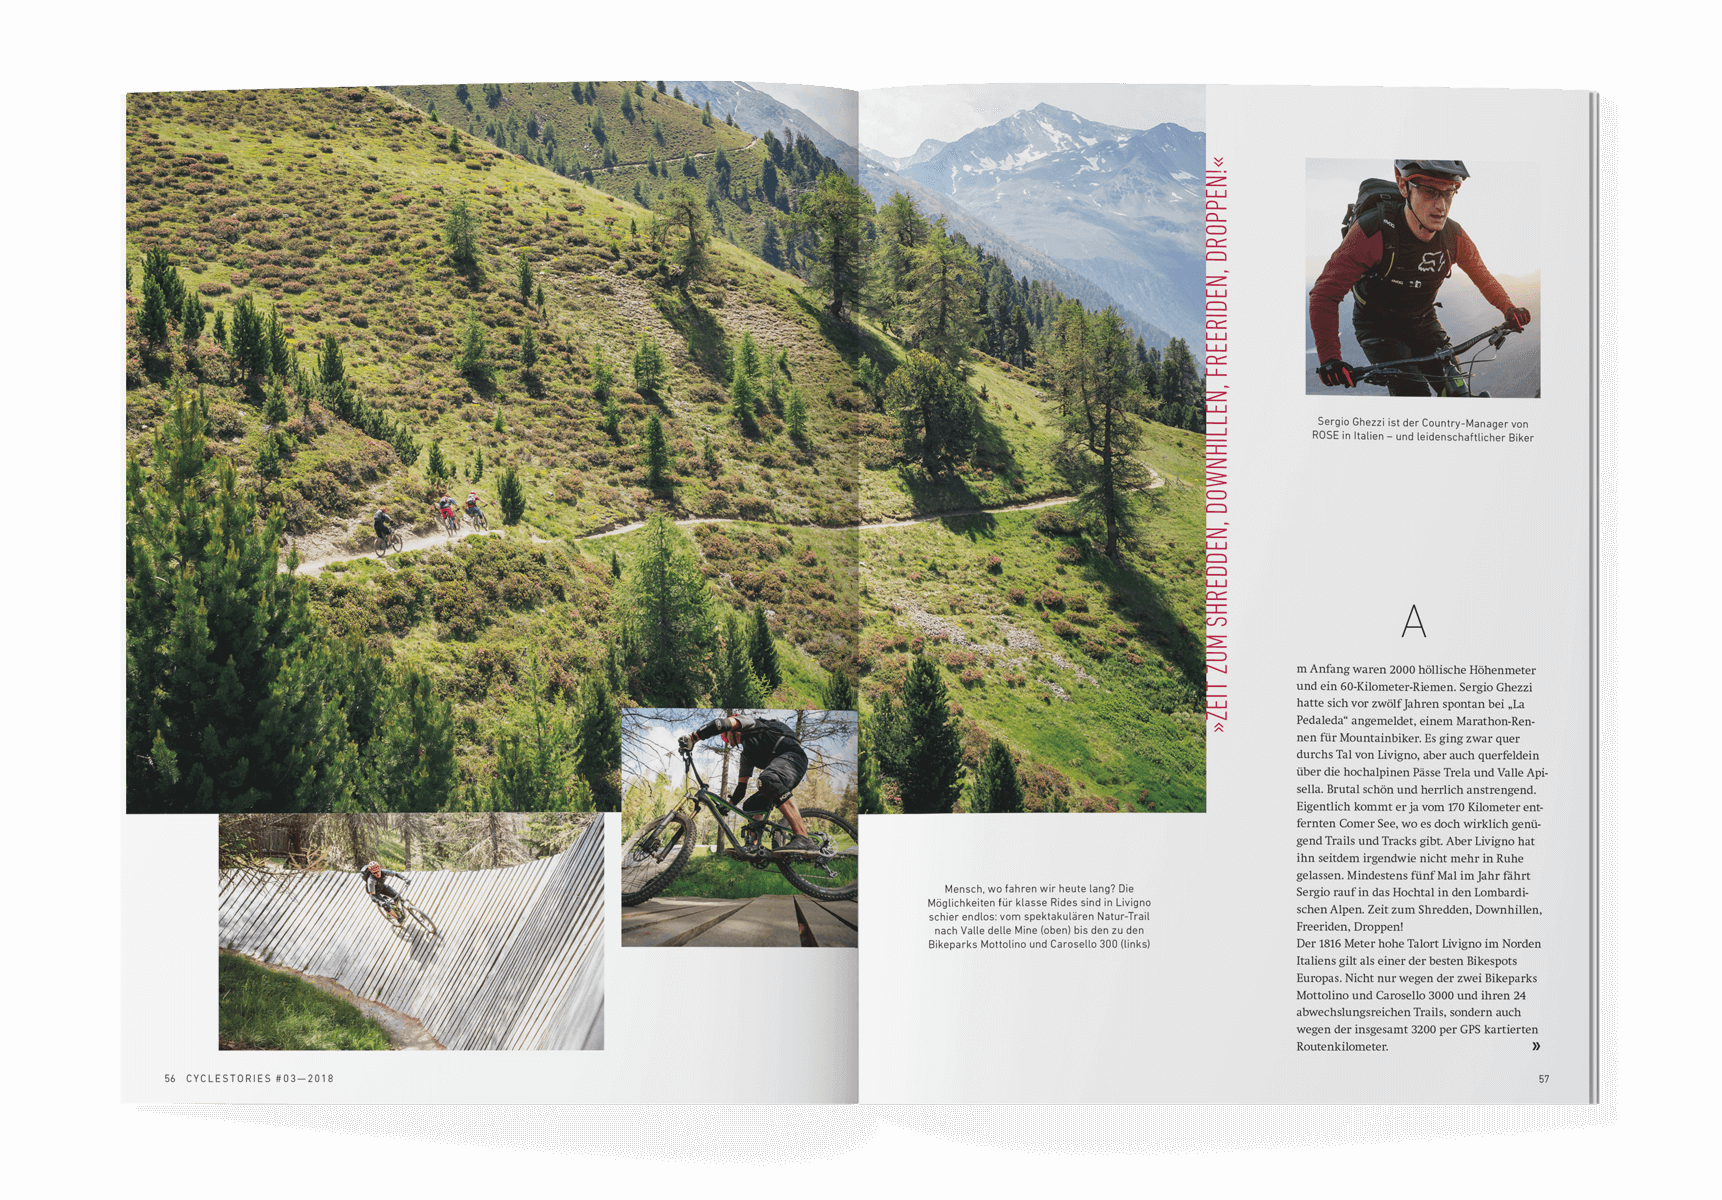 Luckyluu_ROSE_Cyclestories_livigno3_1